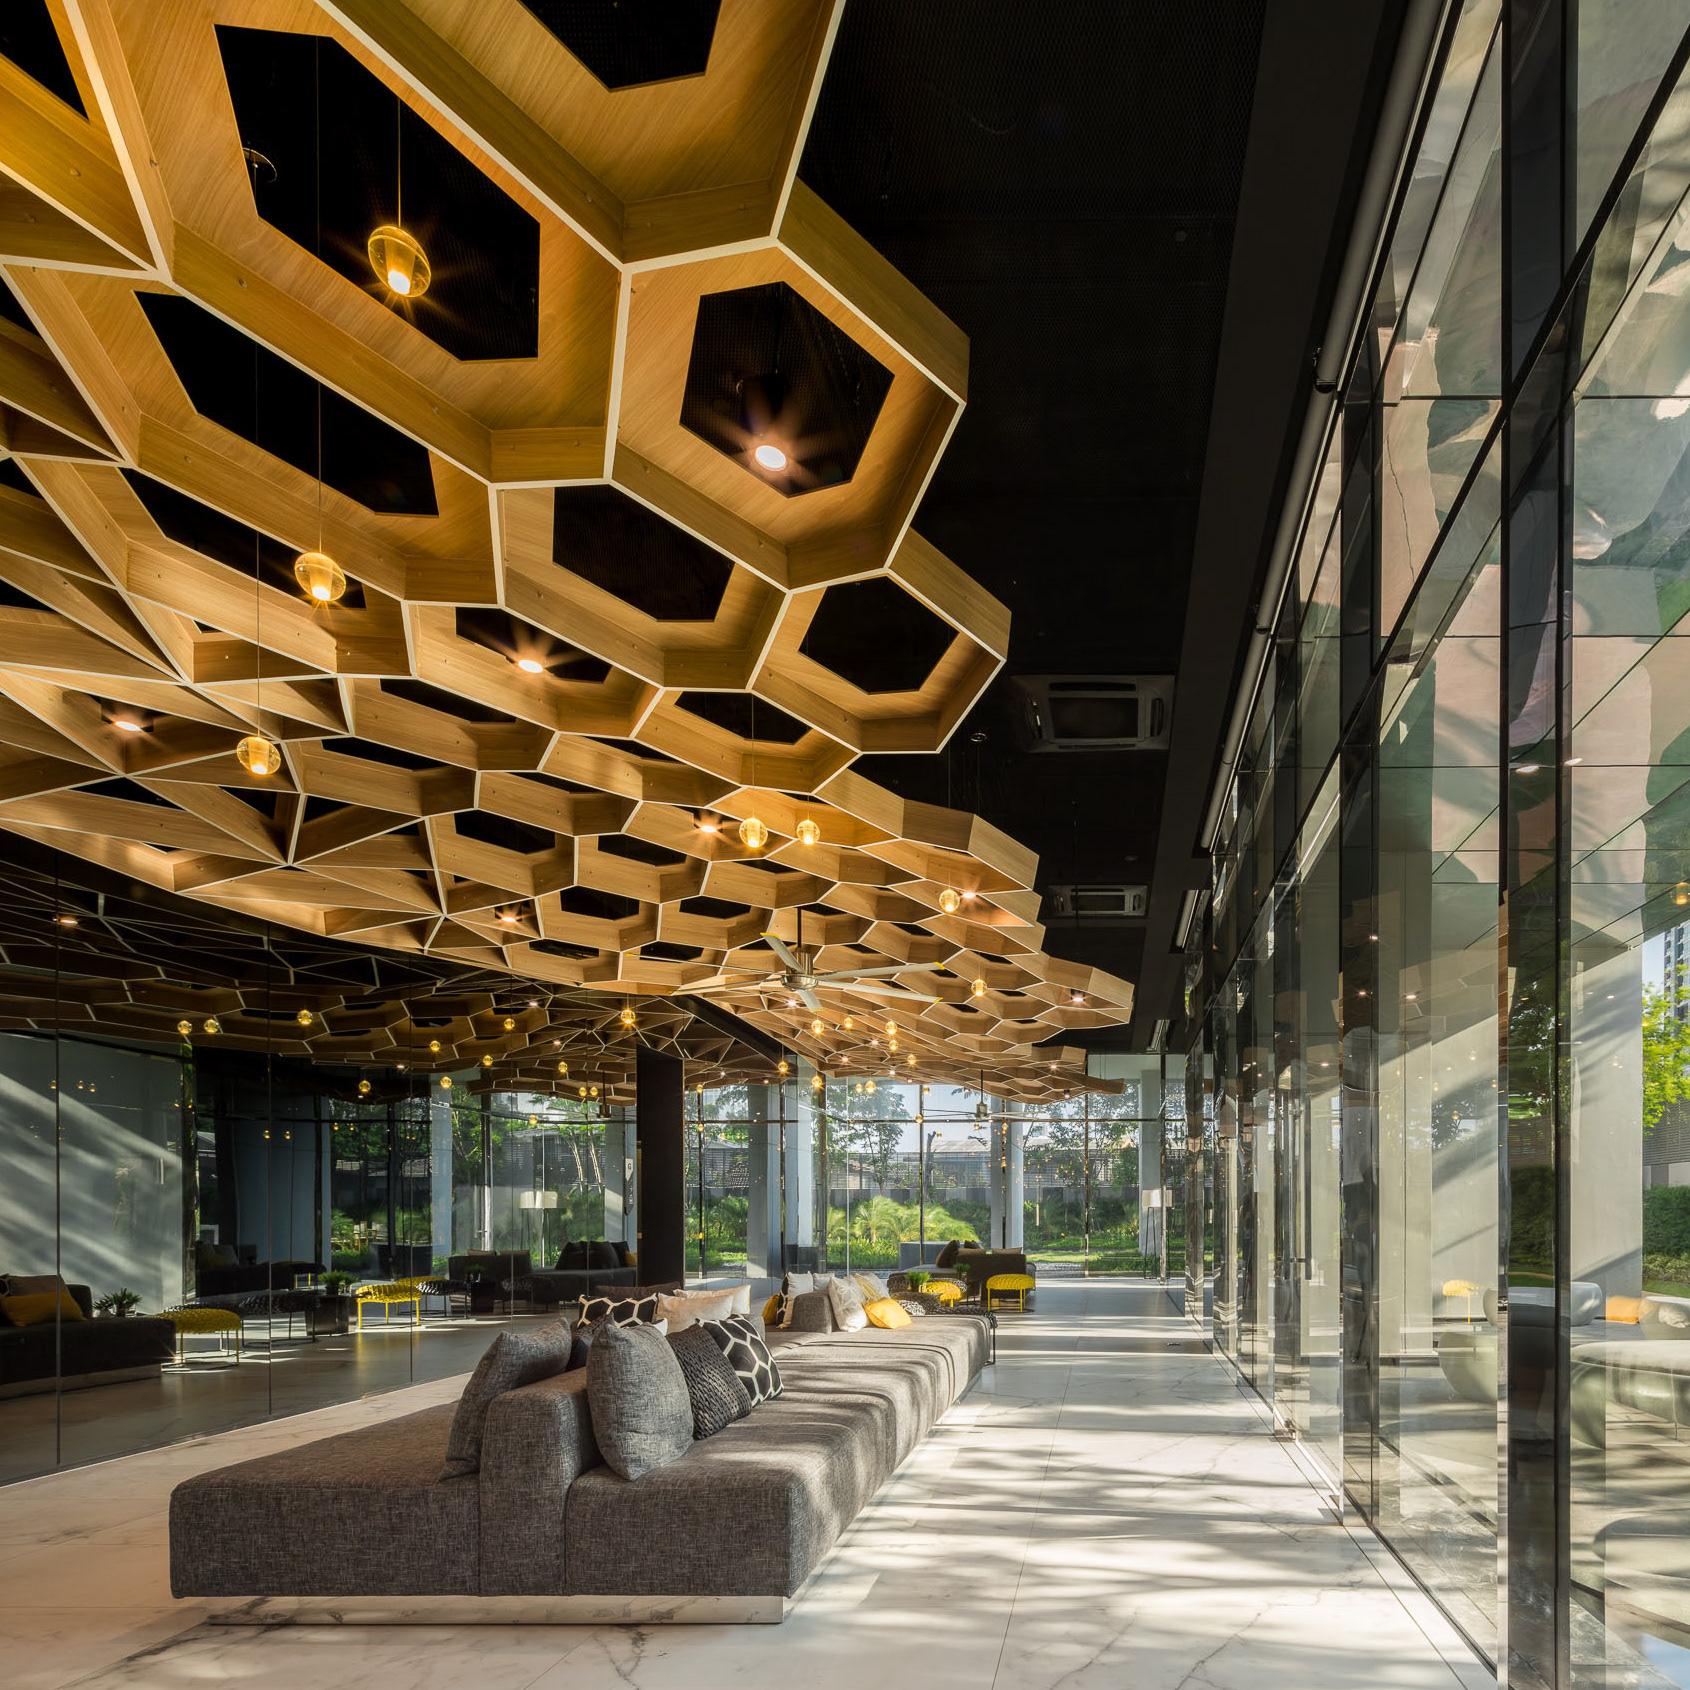 Panoramicstudio m jatujak somdoon architects for Design hotel 1690